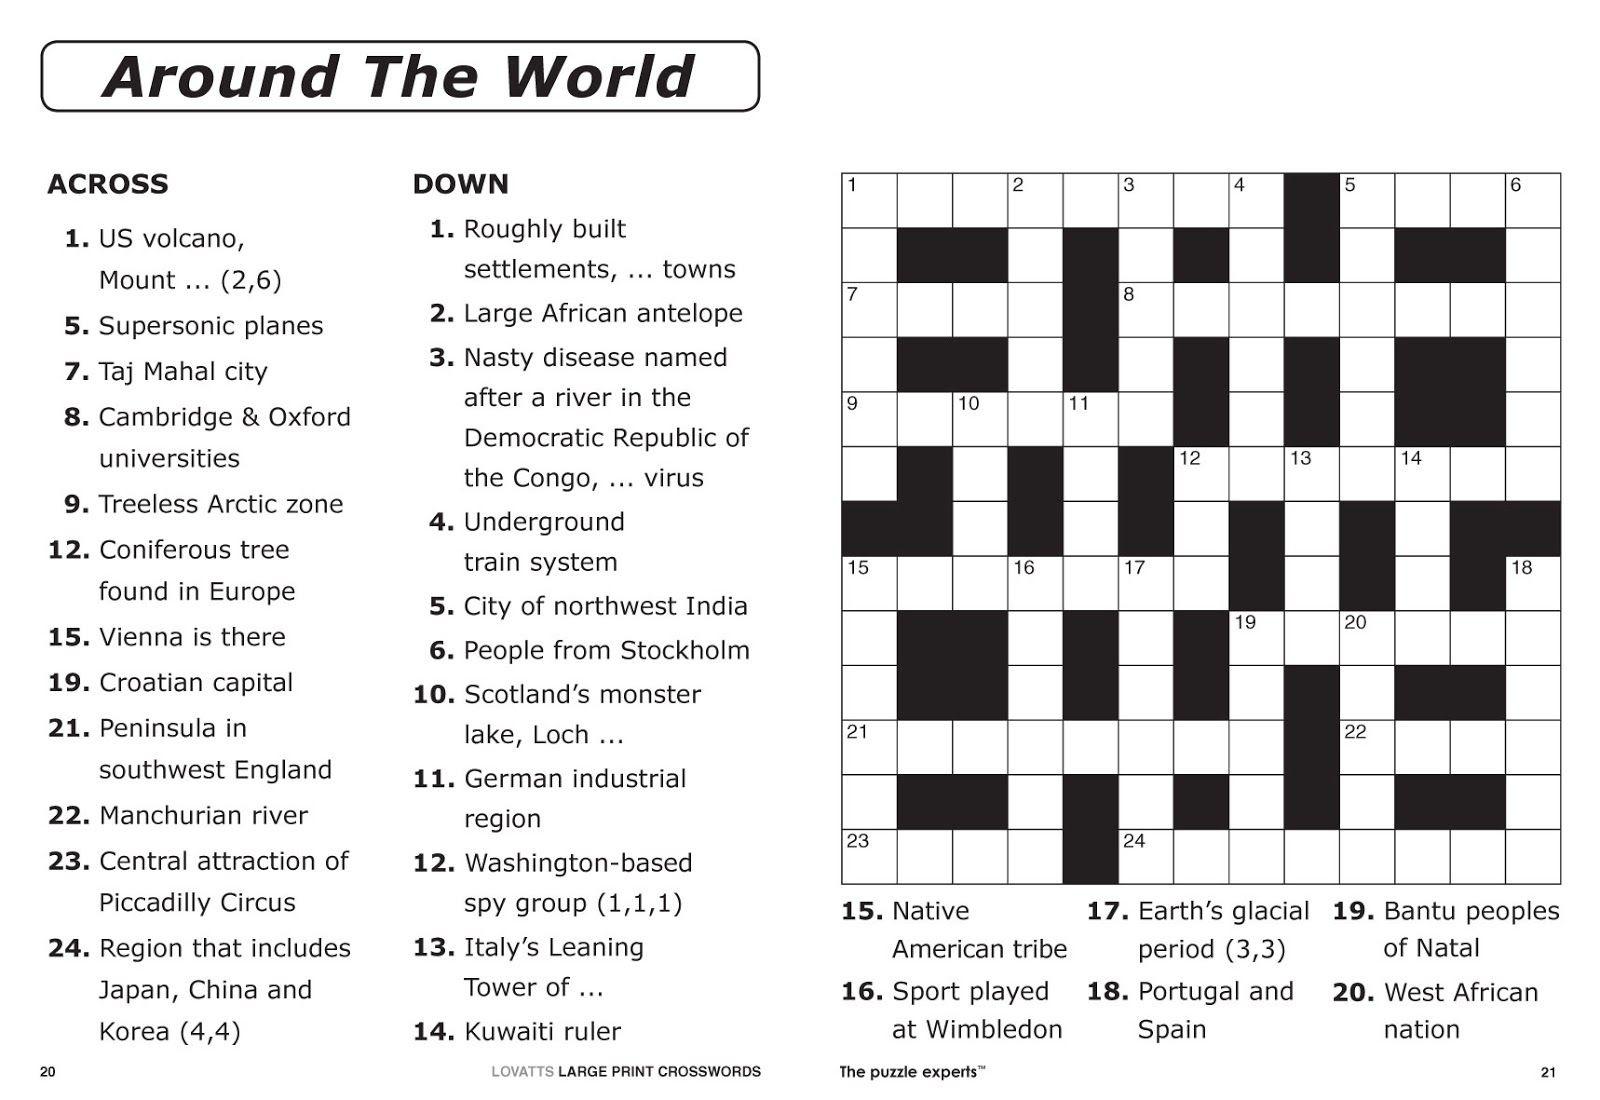 Free Printable Large Print Crossword Puzzles | M3U8 - Free Printable Crosswords Easy